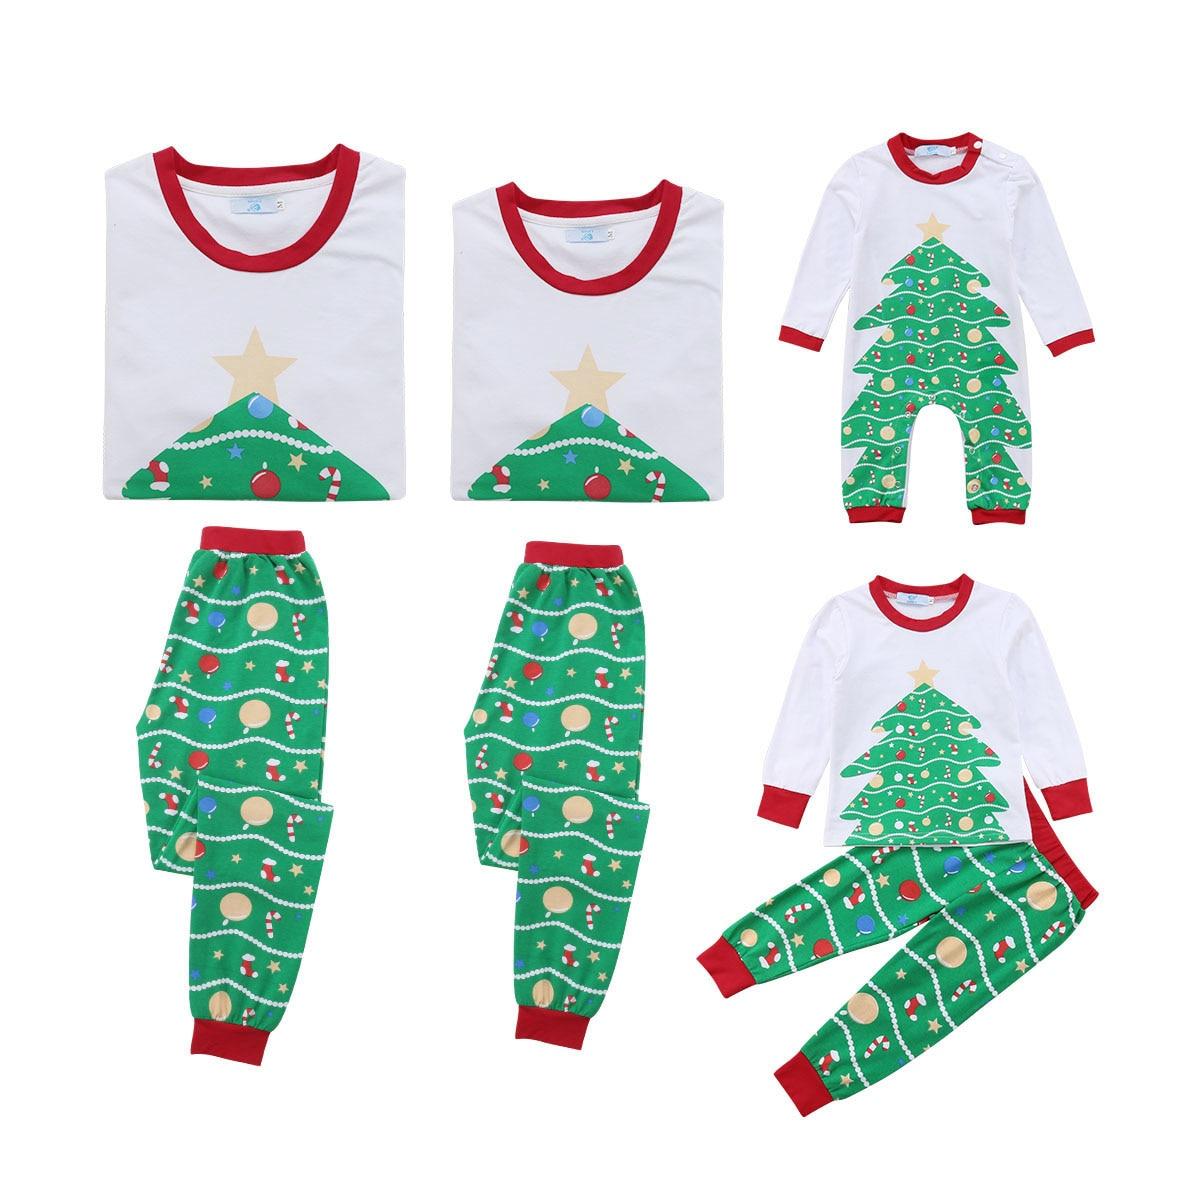 Pudcoco 2019 Lovely Kid Adult Family Matching Christmas Tree Pajamas PJs  Sets Xmas Sleepwear Nightwear UK 5ae2e147b